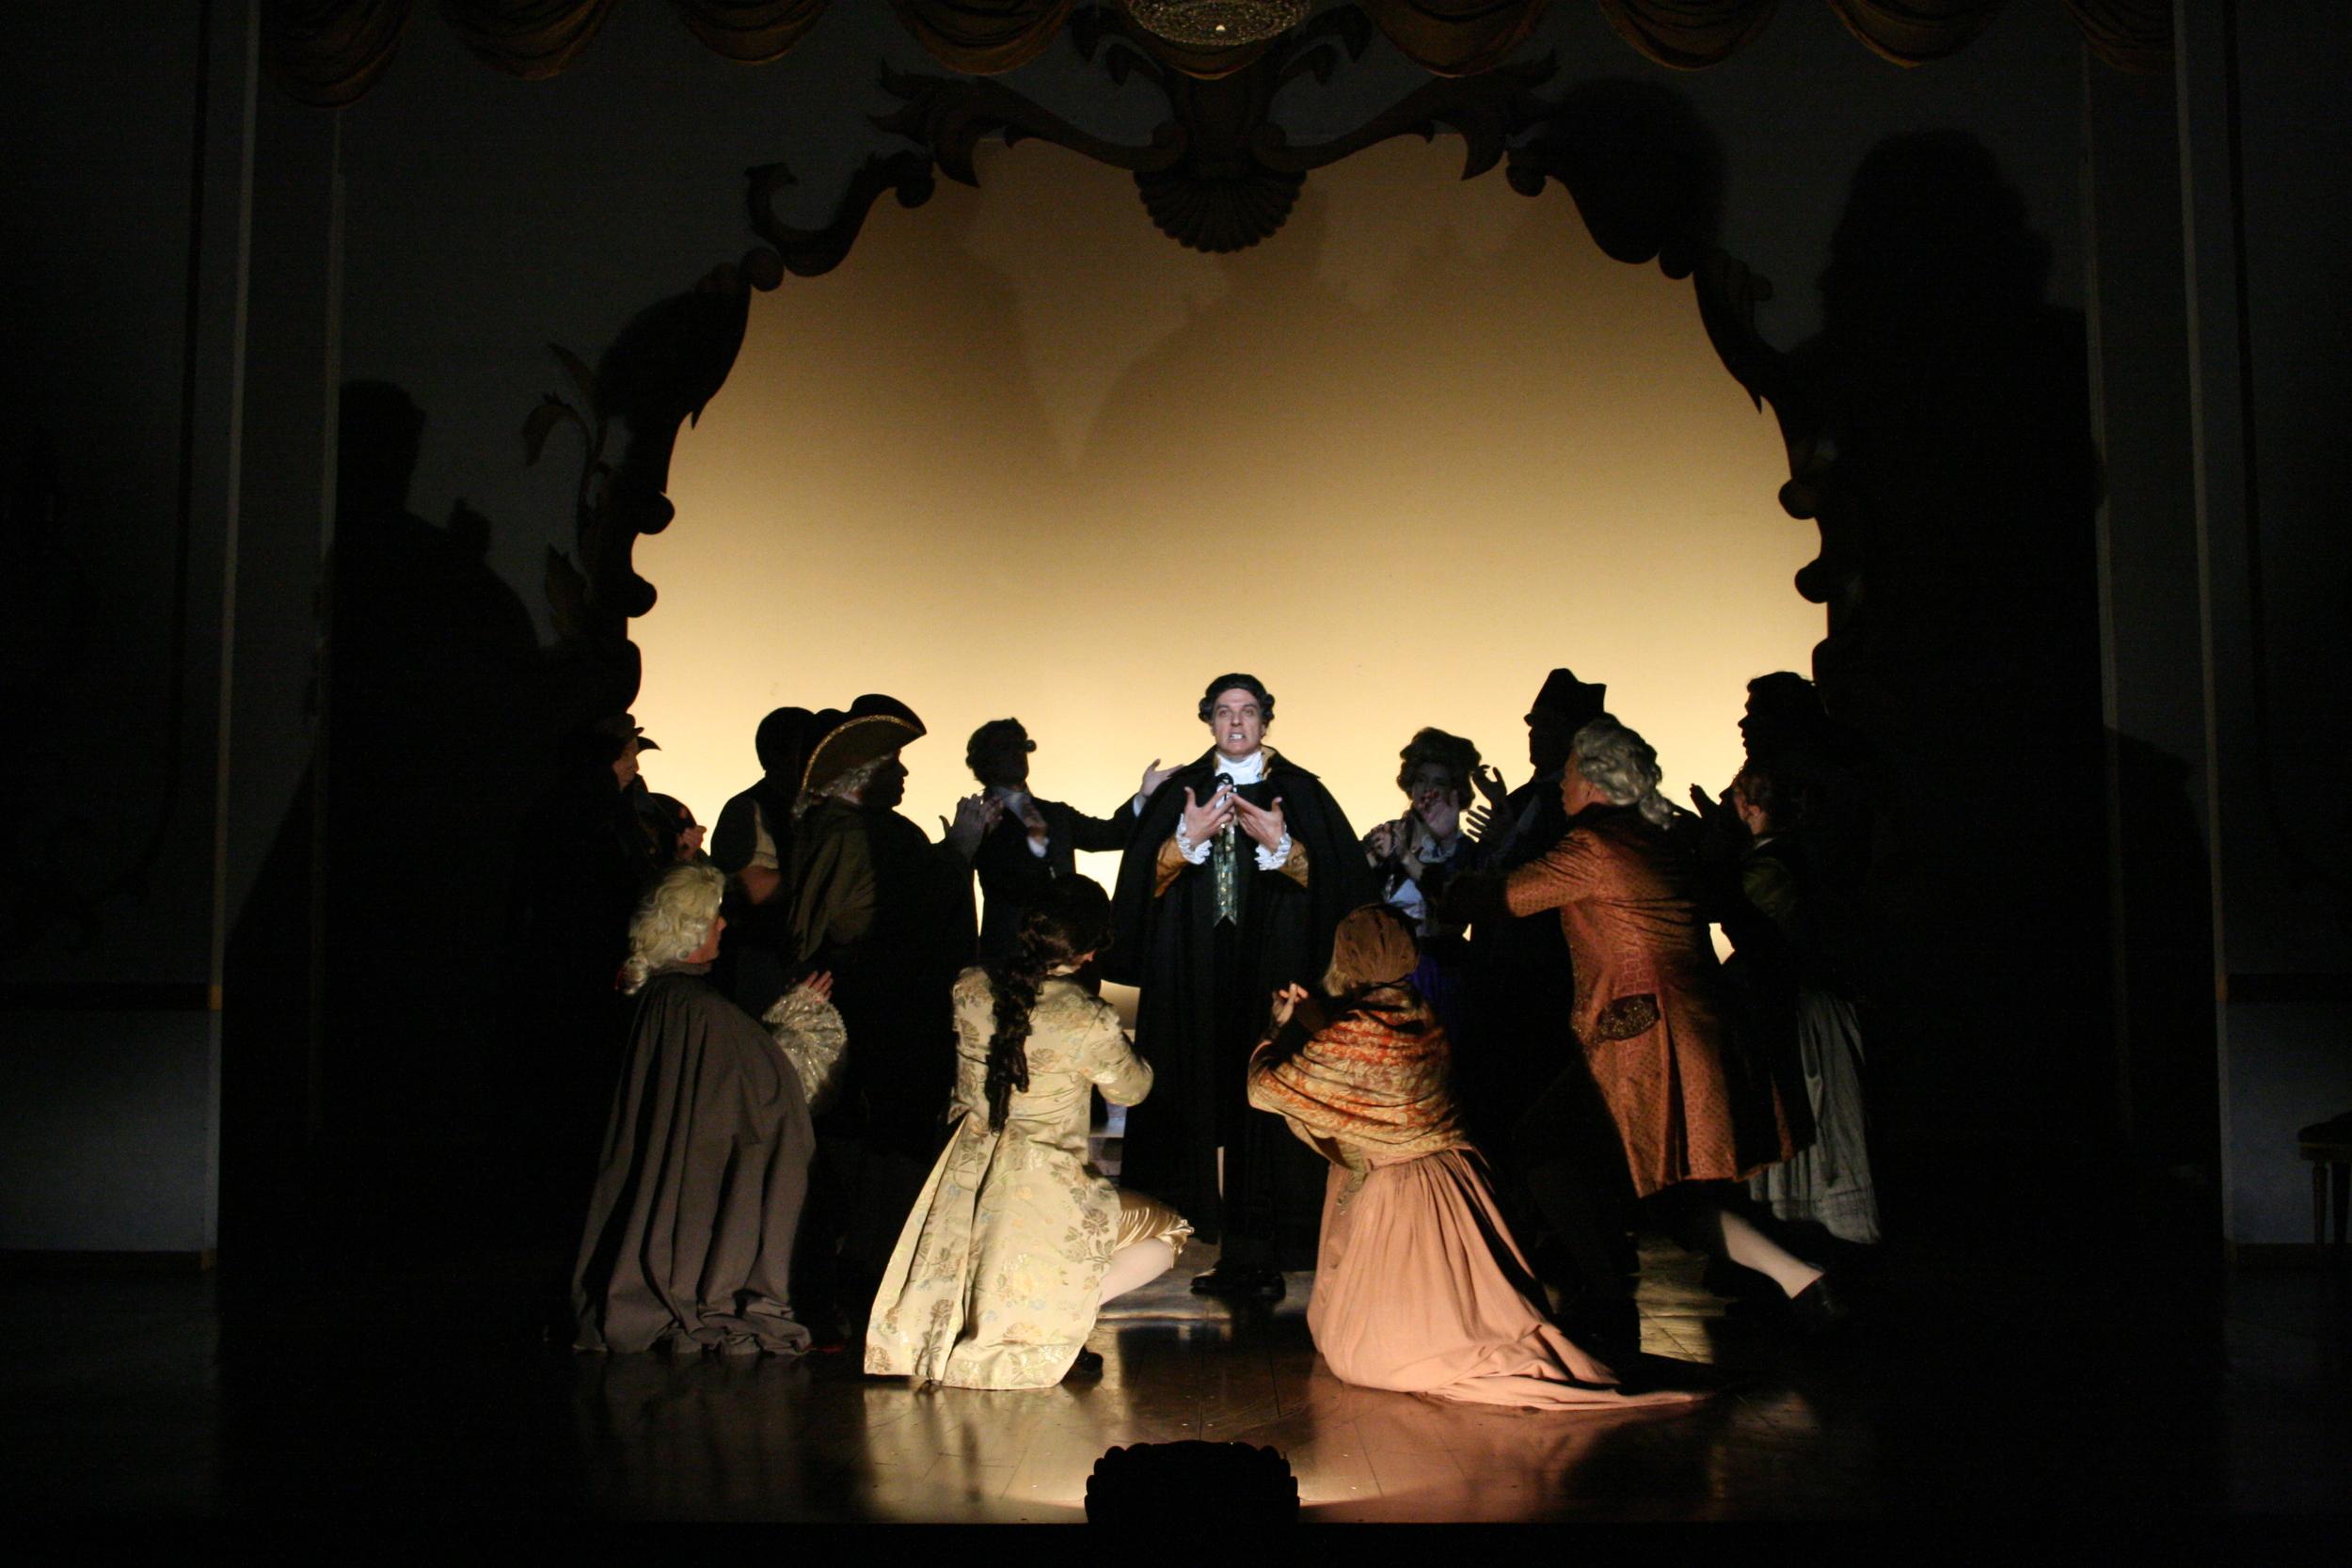 Amadeus - Slaieri (Robert Cuccioli), and Ensemble.jpg